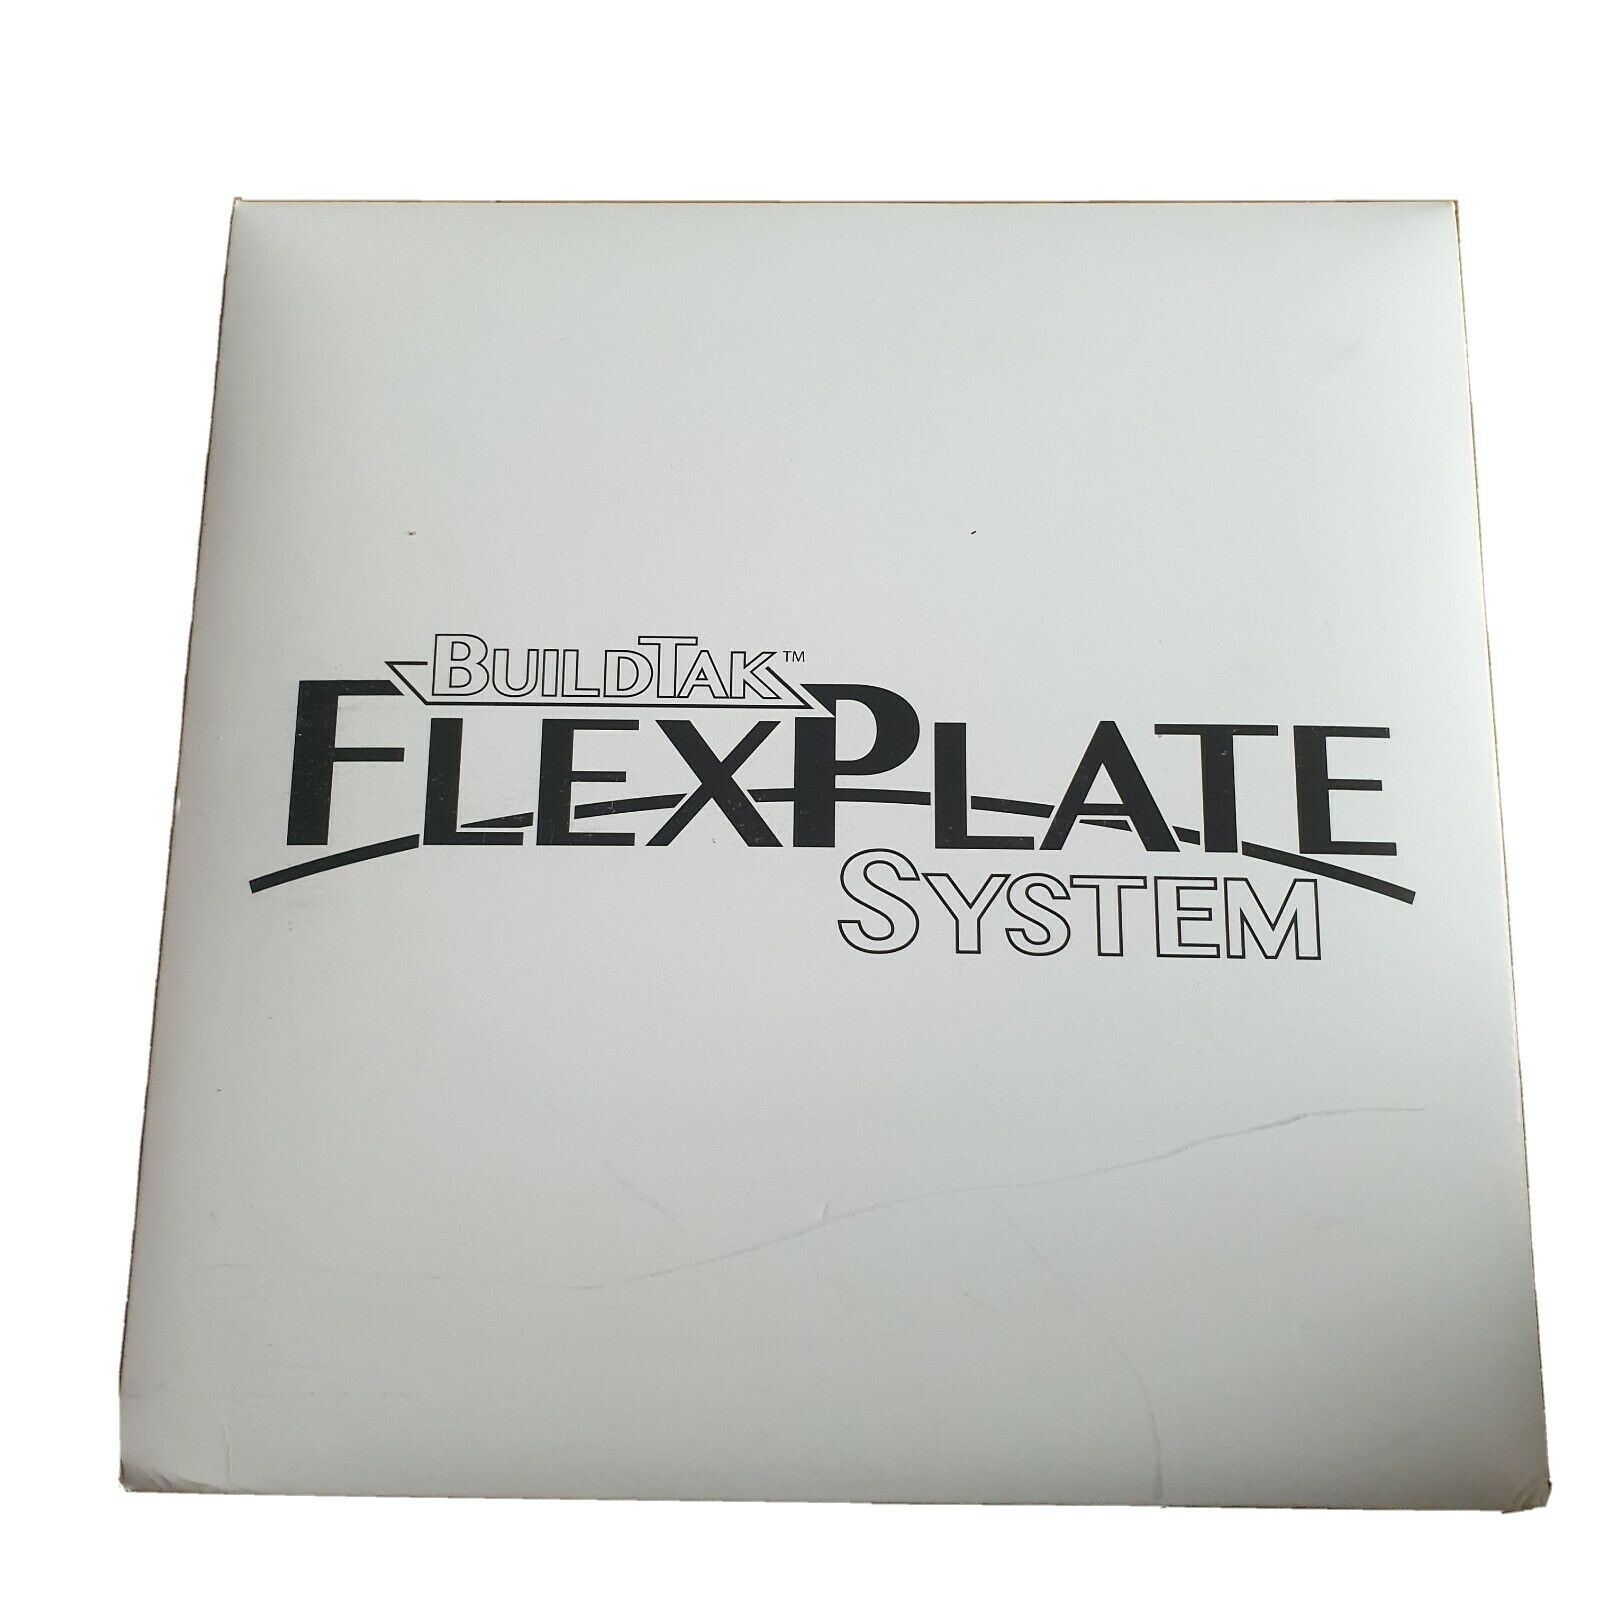 Buildtak Flexplate System